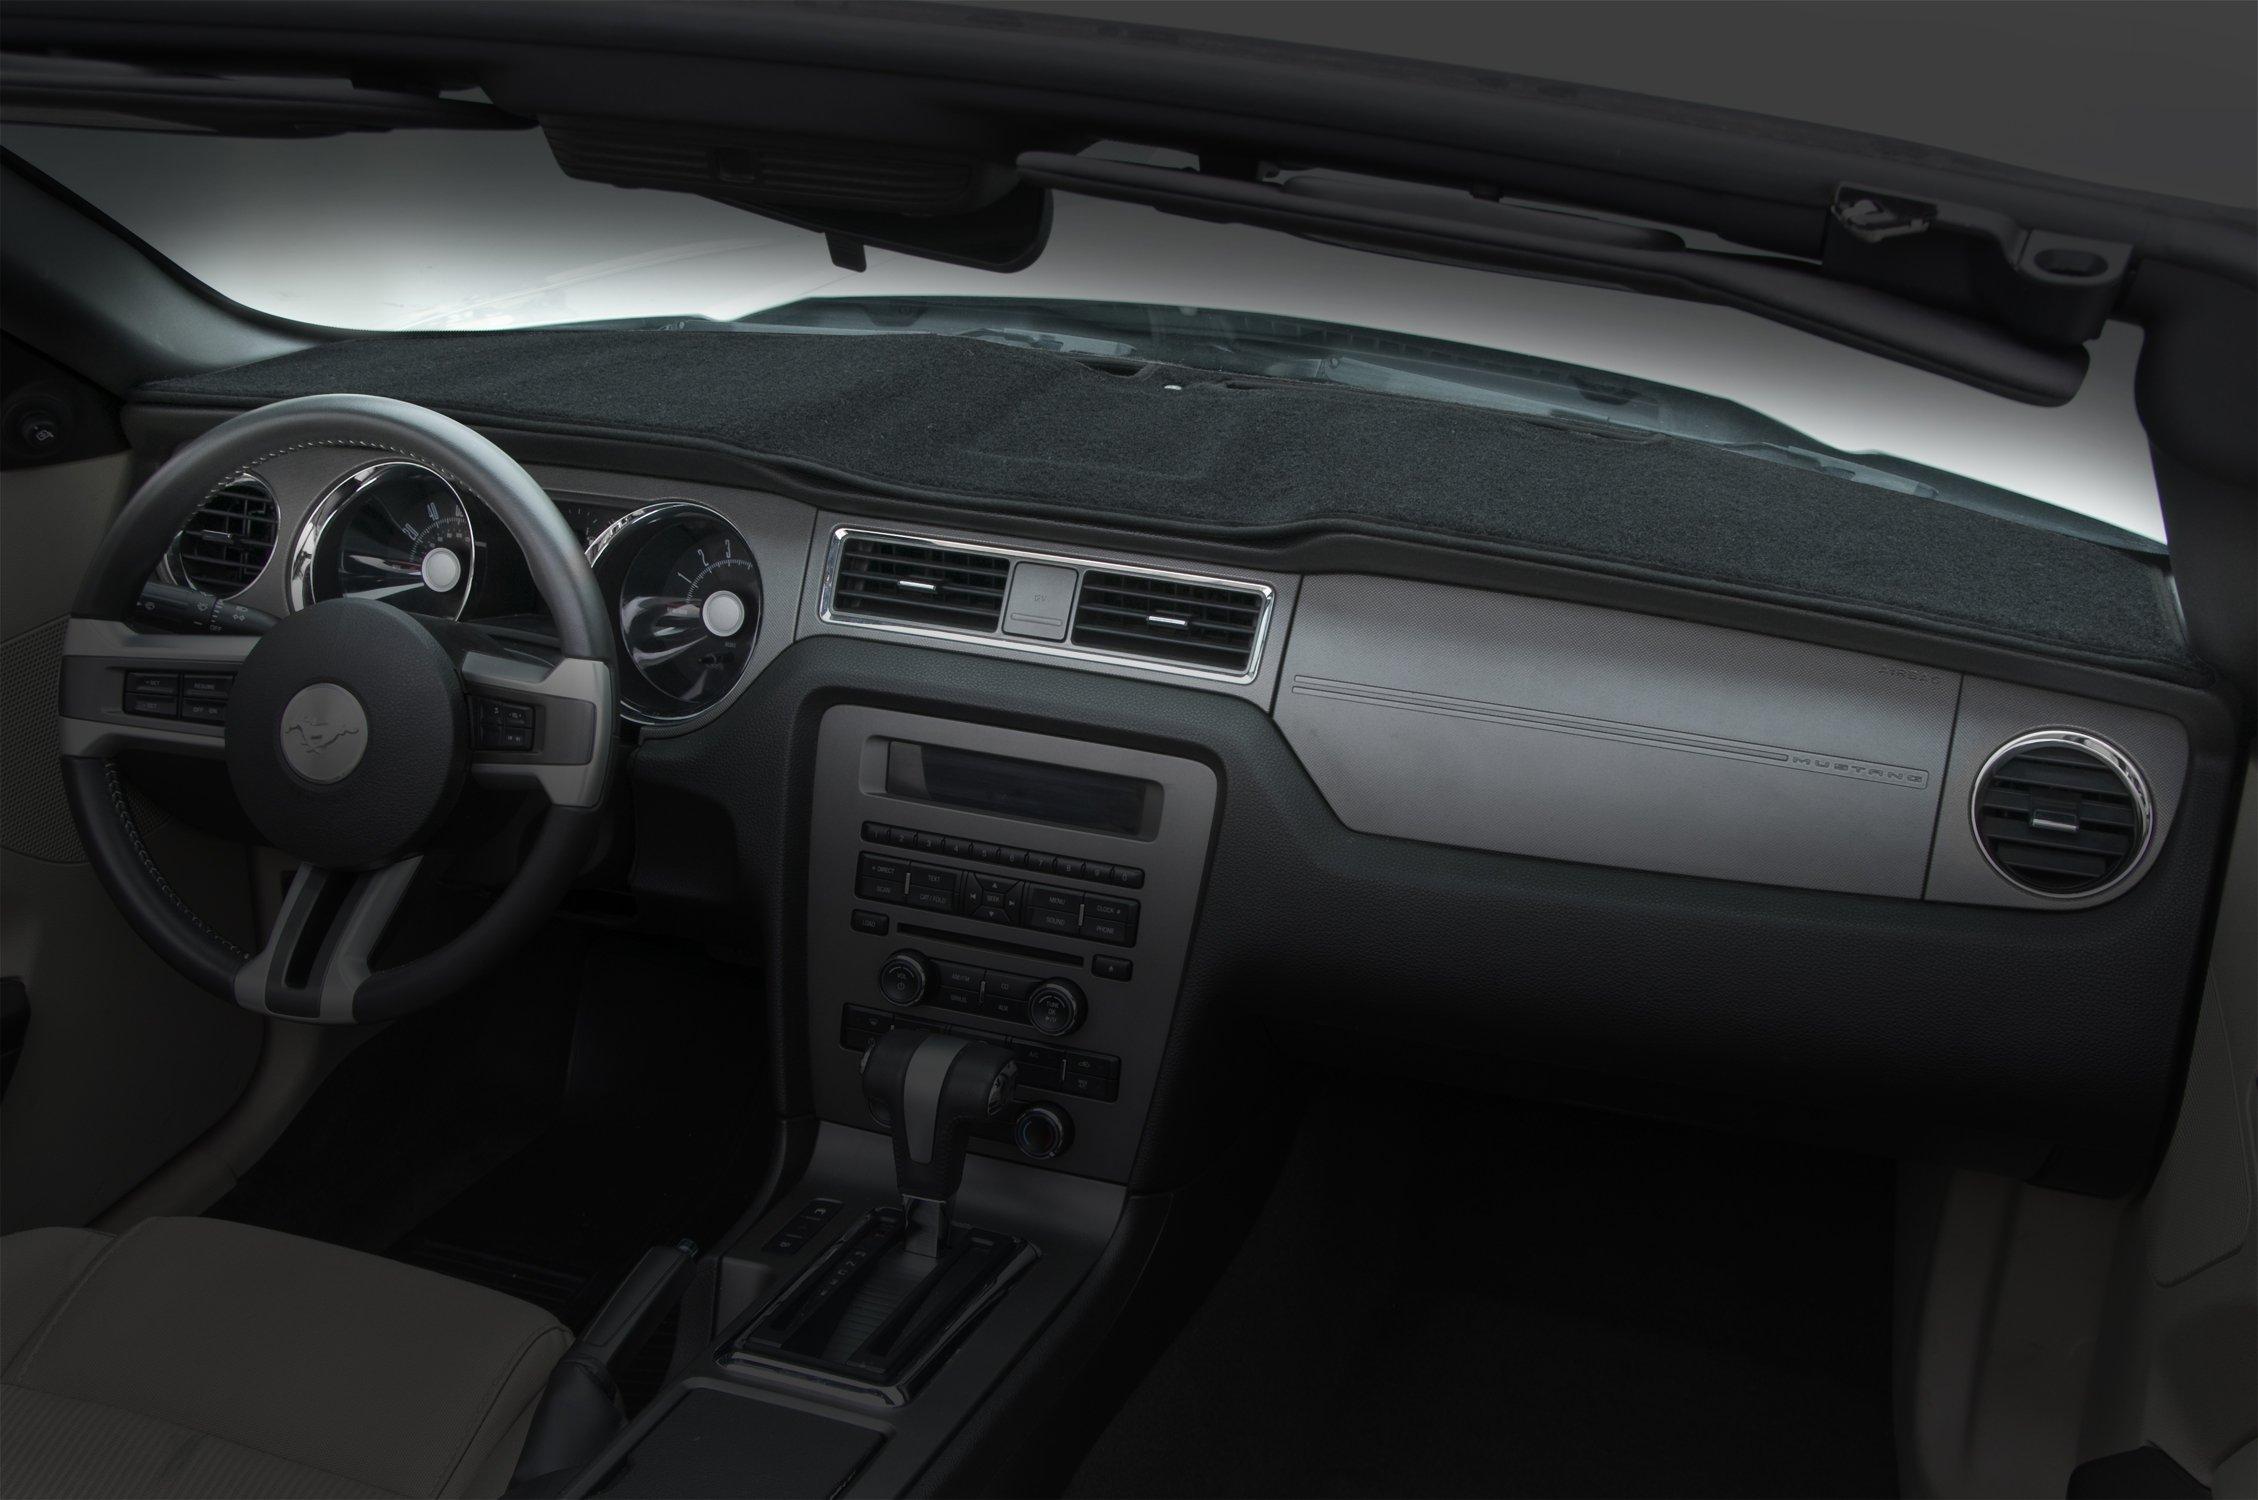 Coverking Custom Fit Dashcovers for Select Mazda 3 Models - Poly Carpet (Black)